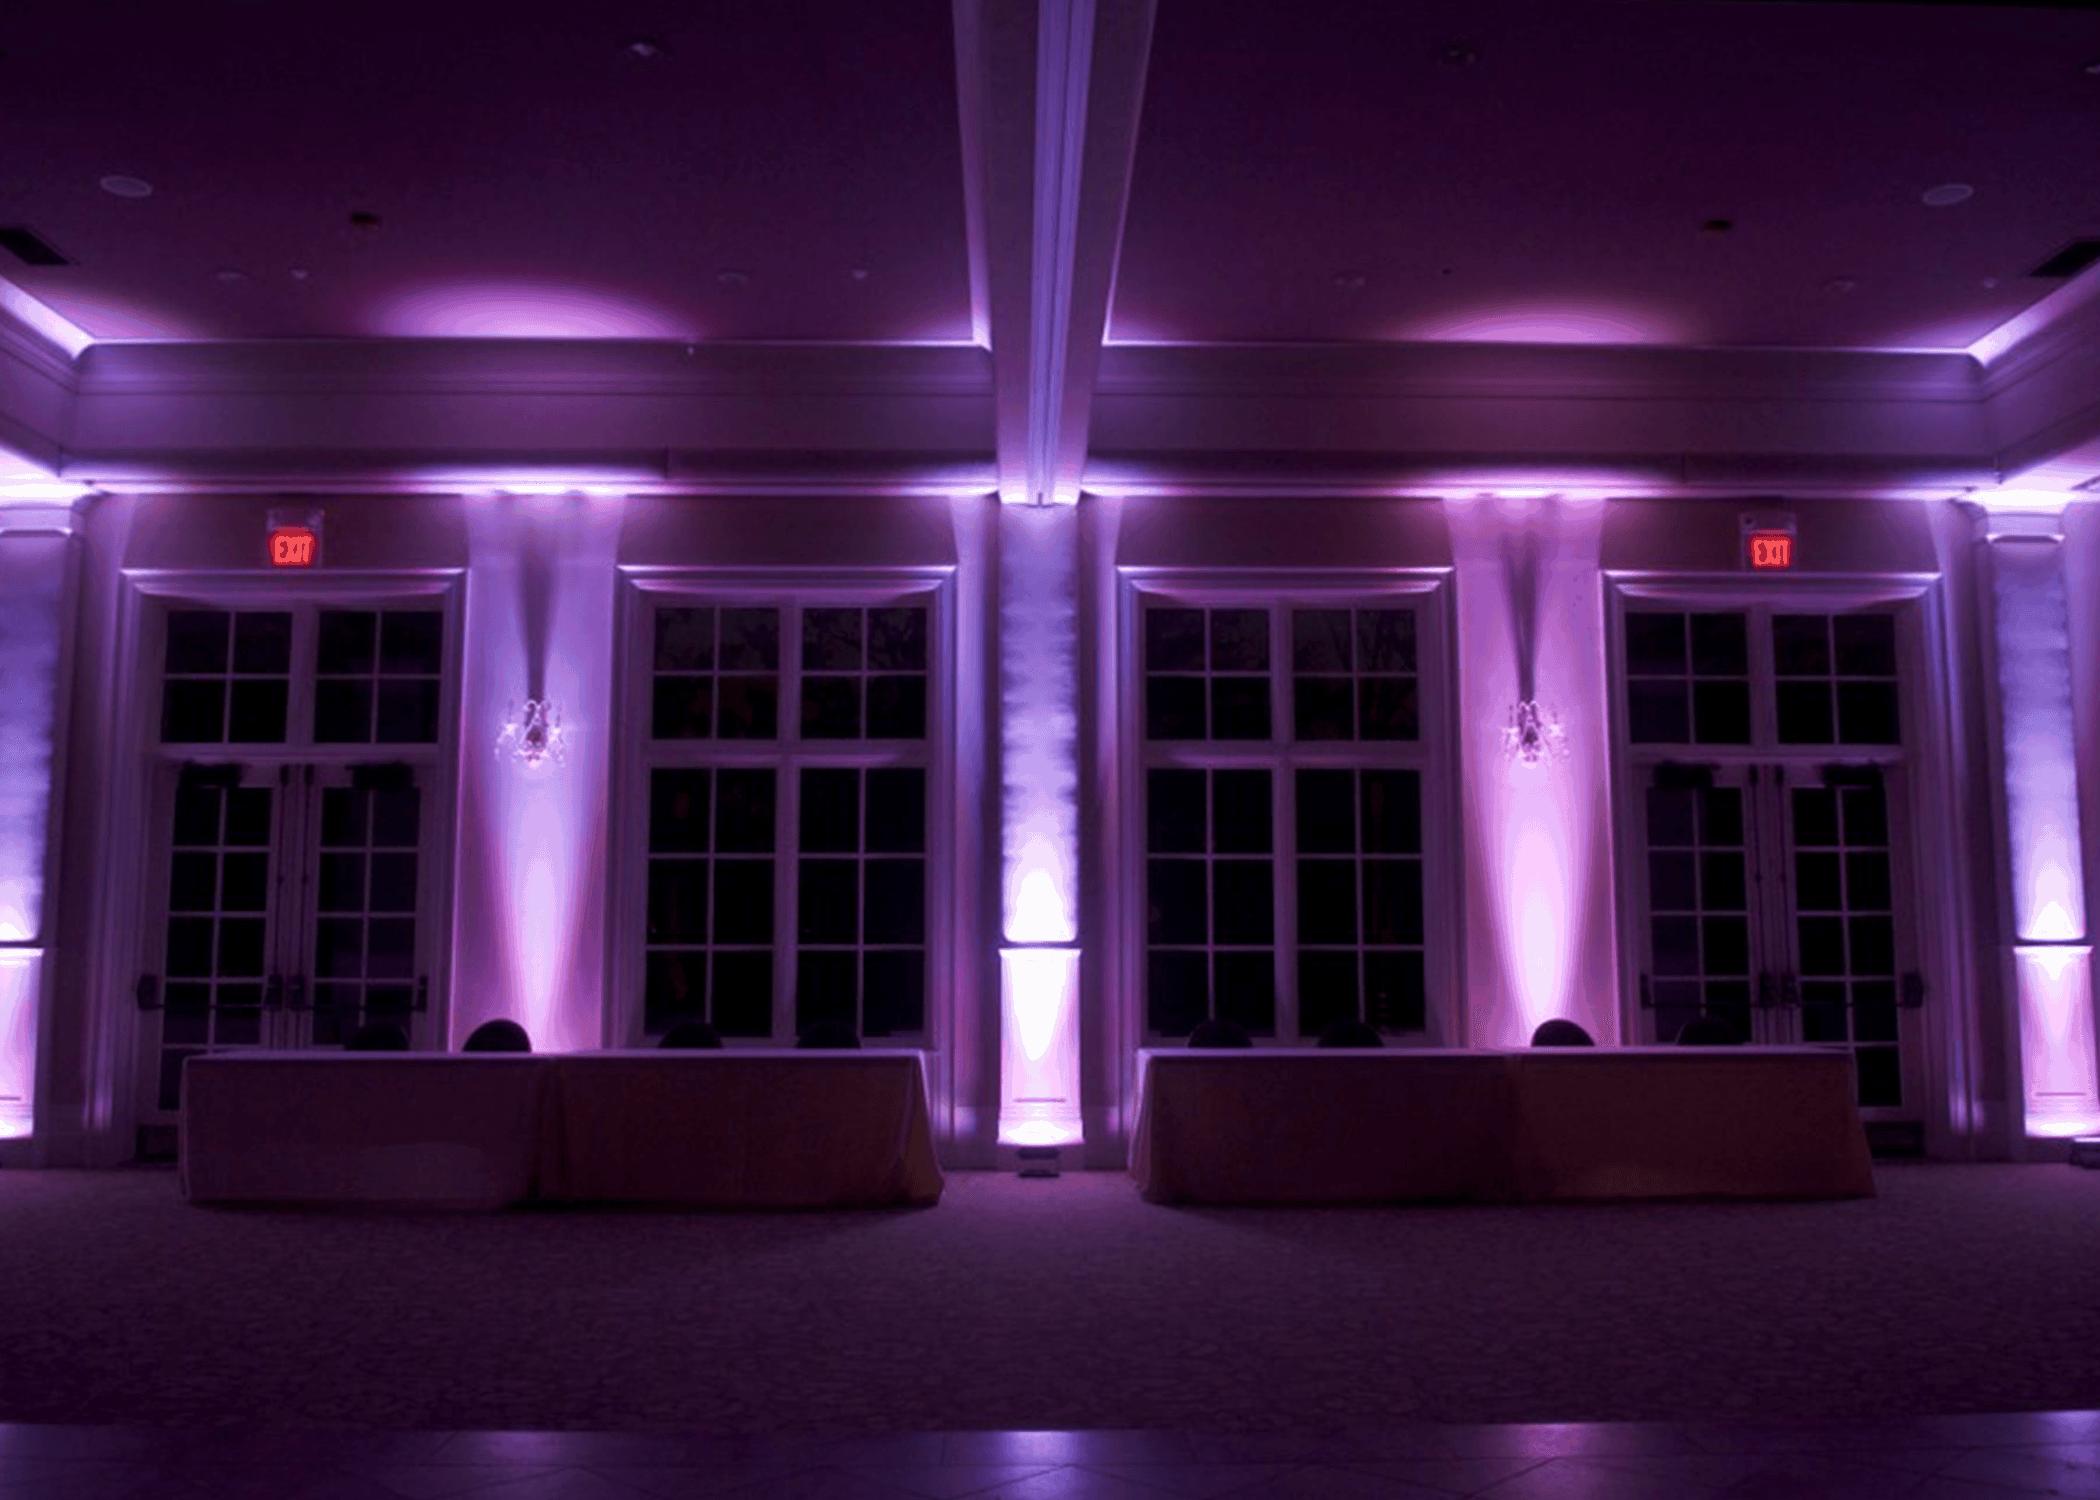 uplights-purple